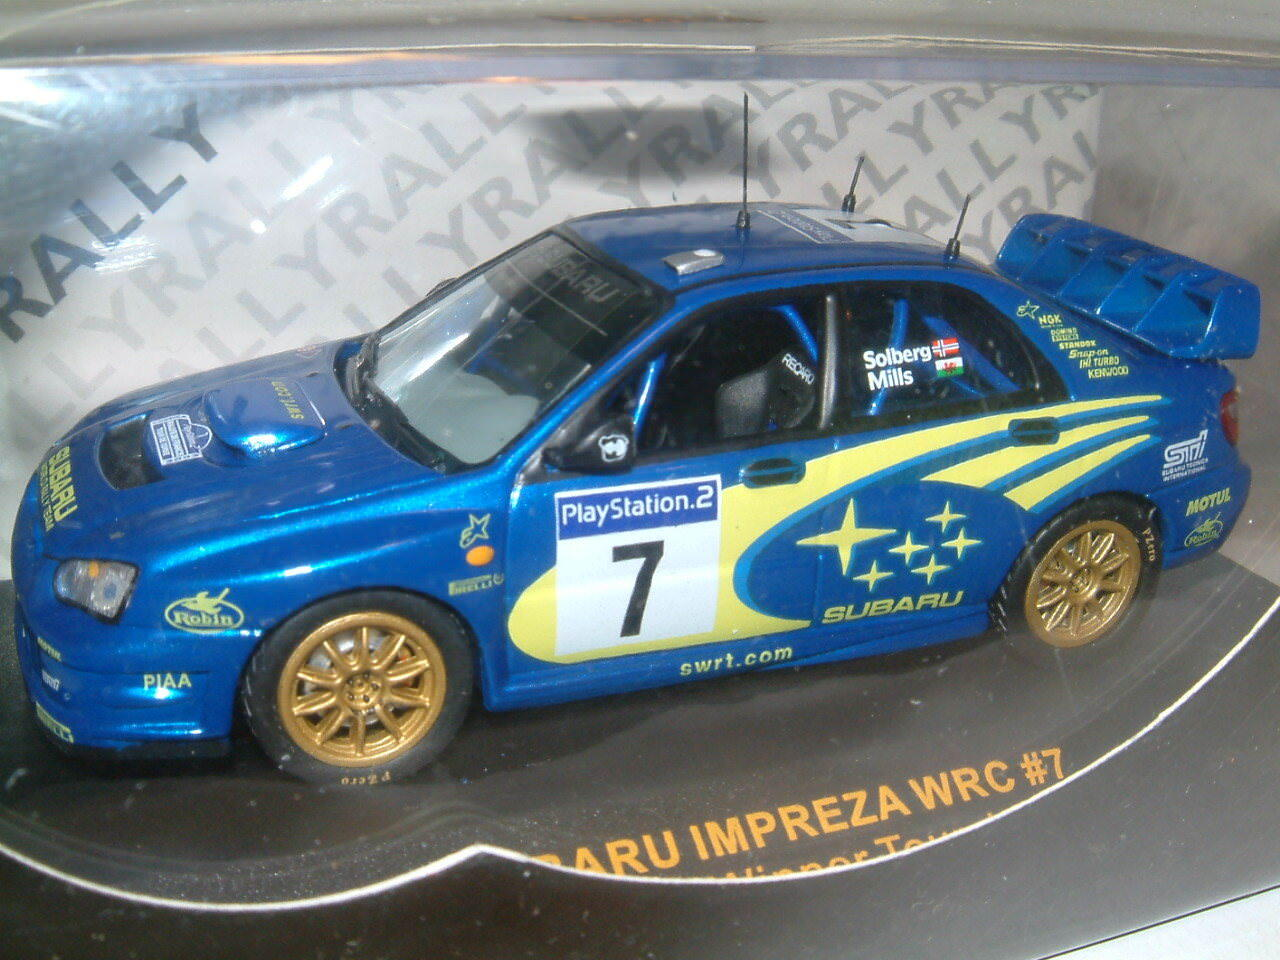 1 43 SUBARU IMPREZA WRC,2003 TOUR DE CORSE RALLY, SOLBERG MILLS. IXO RAM128